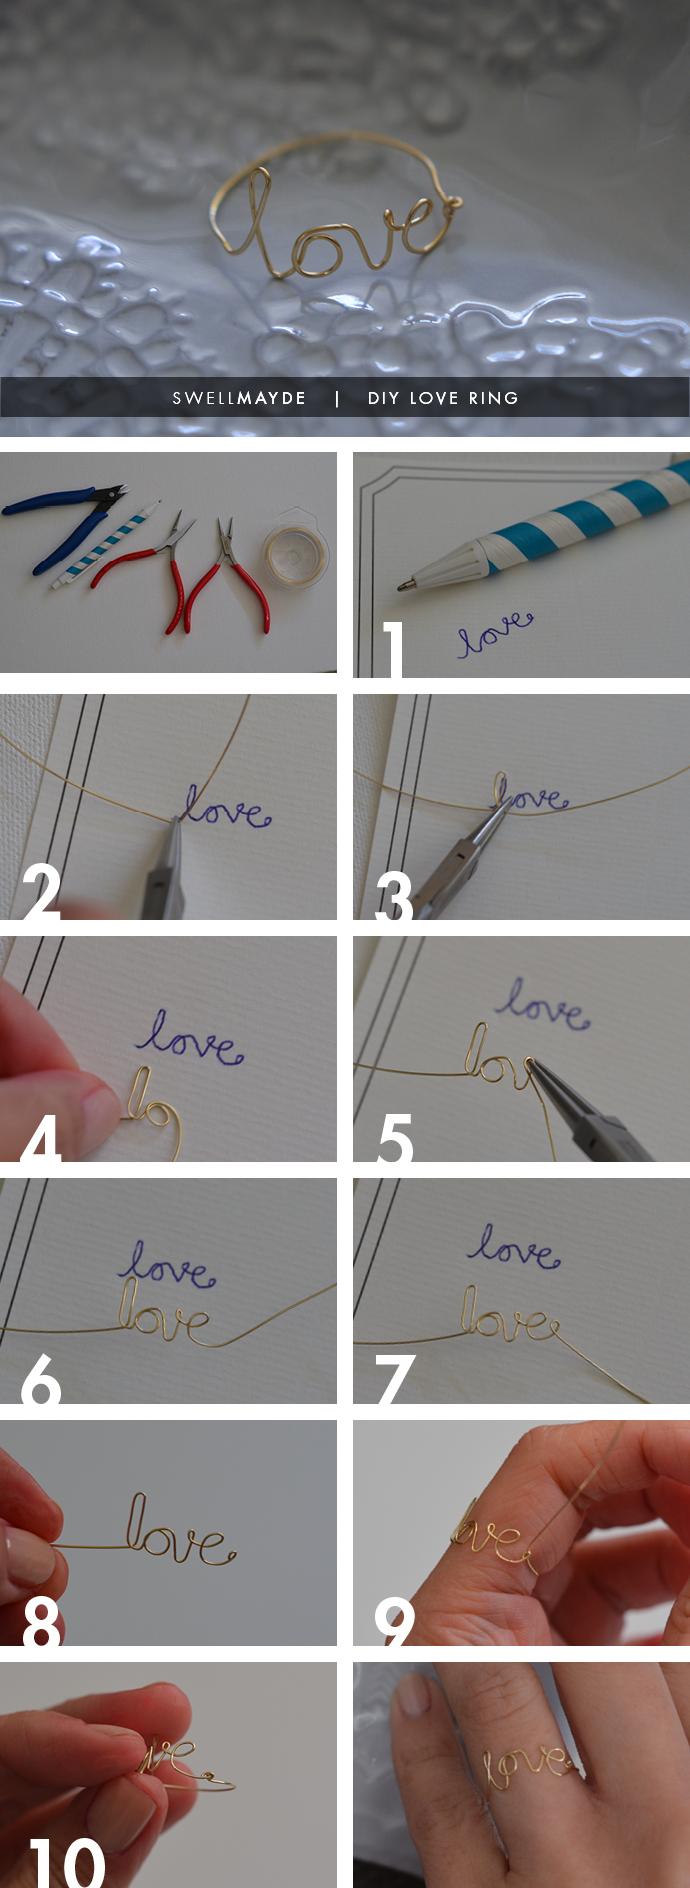 swellmayde: VALENTINE'S DIY | WIRE LOVE RING